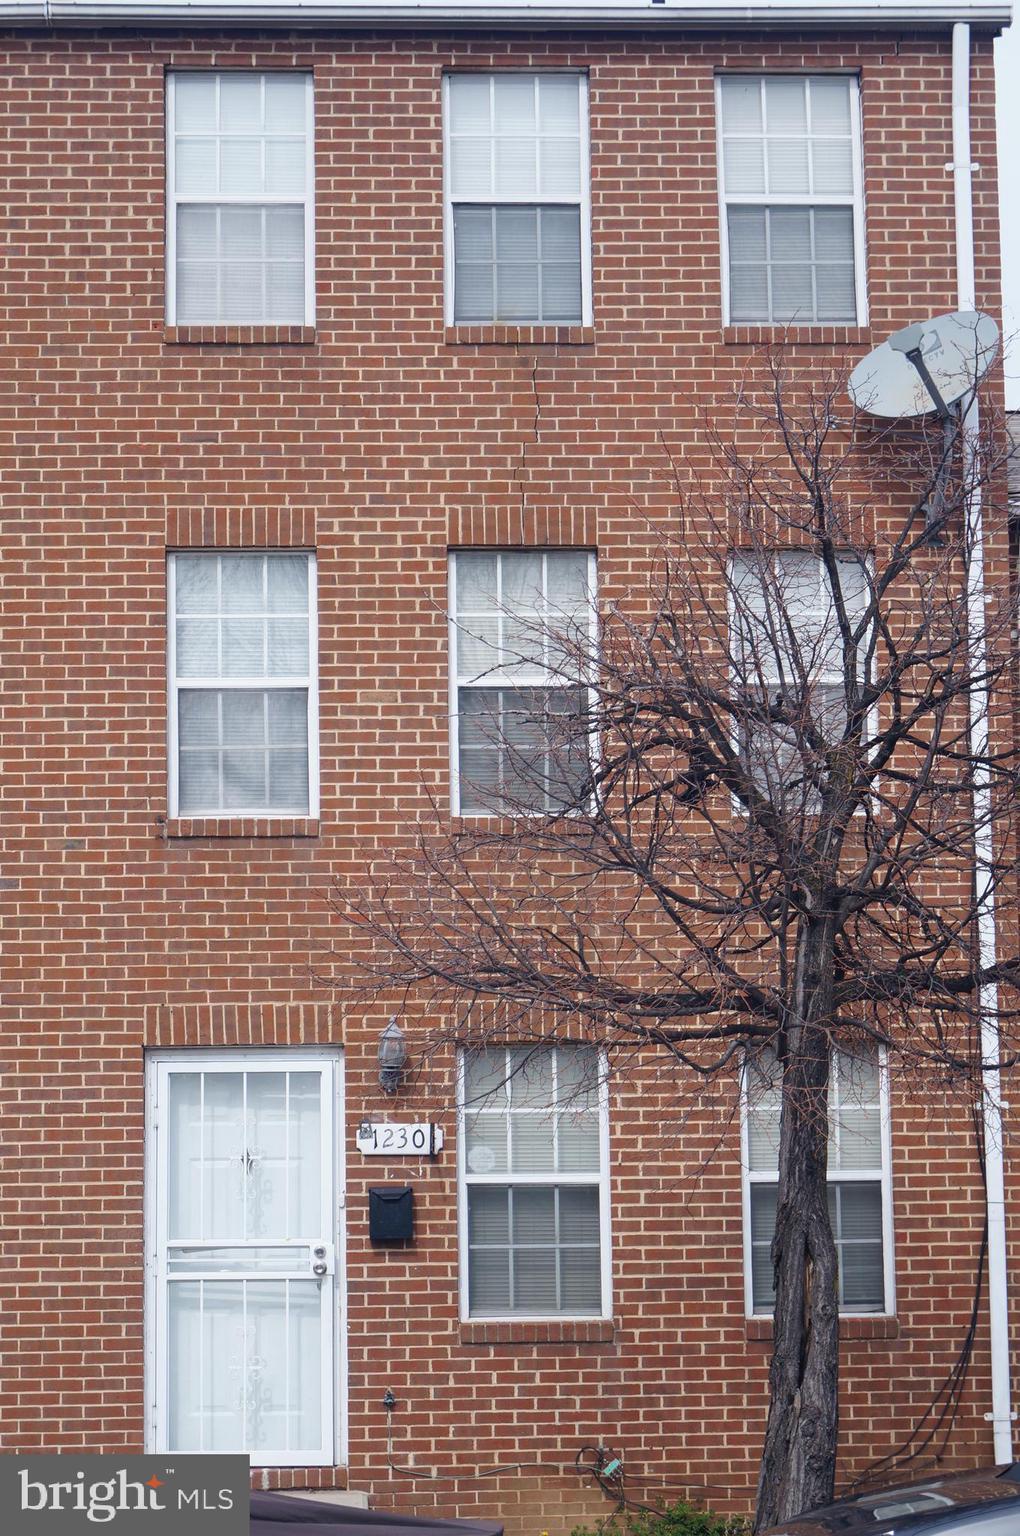 1230 E Madison St, Baltimore, MD, 21202